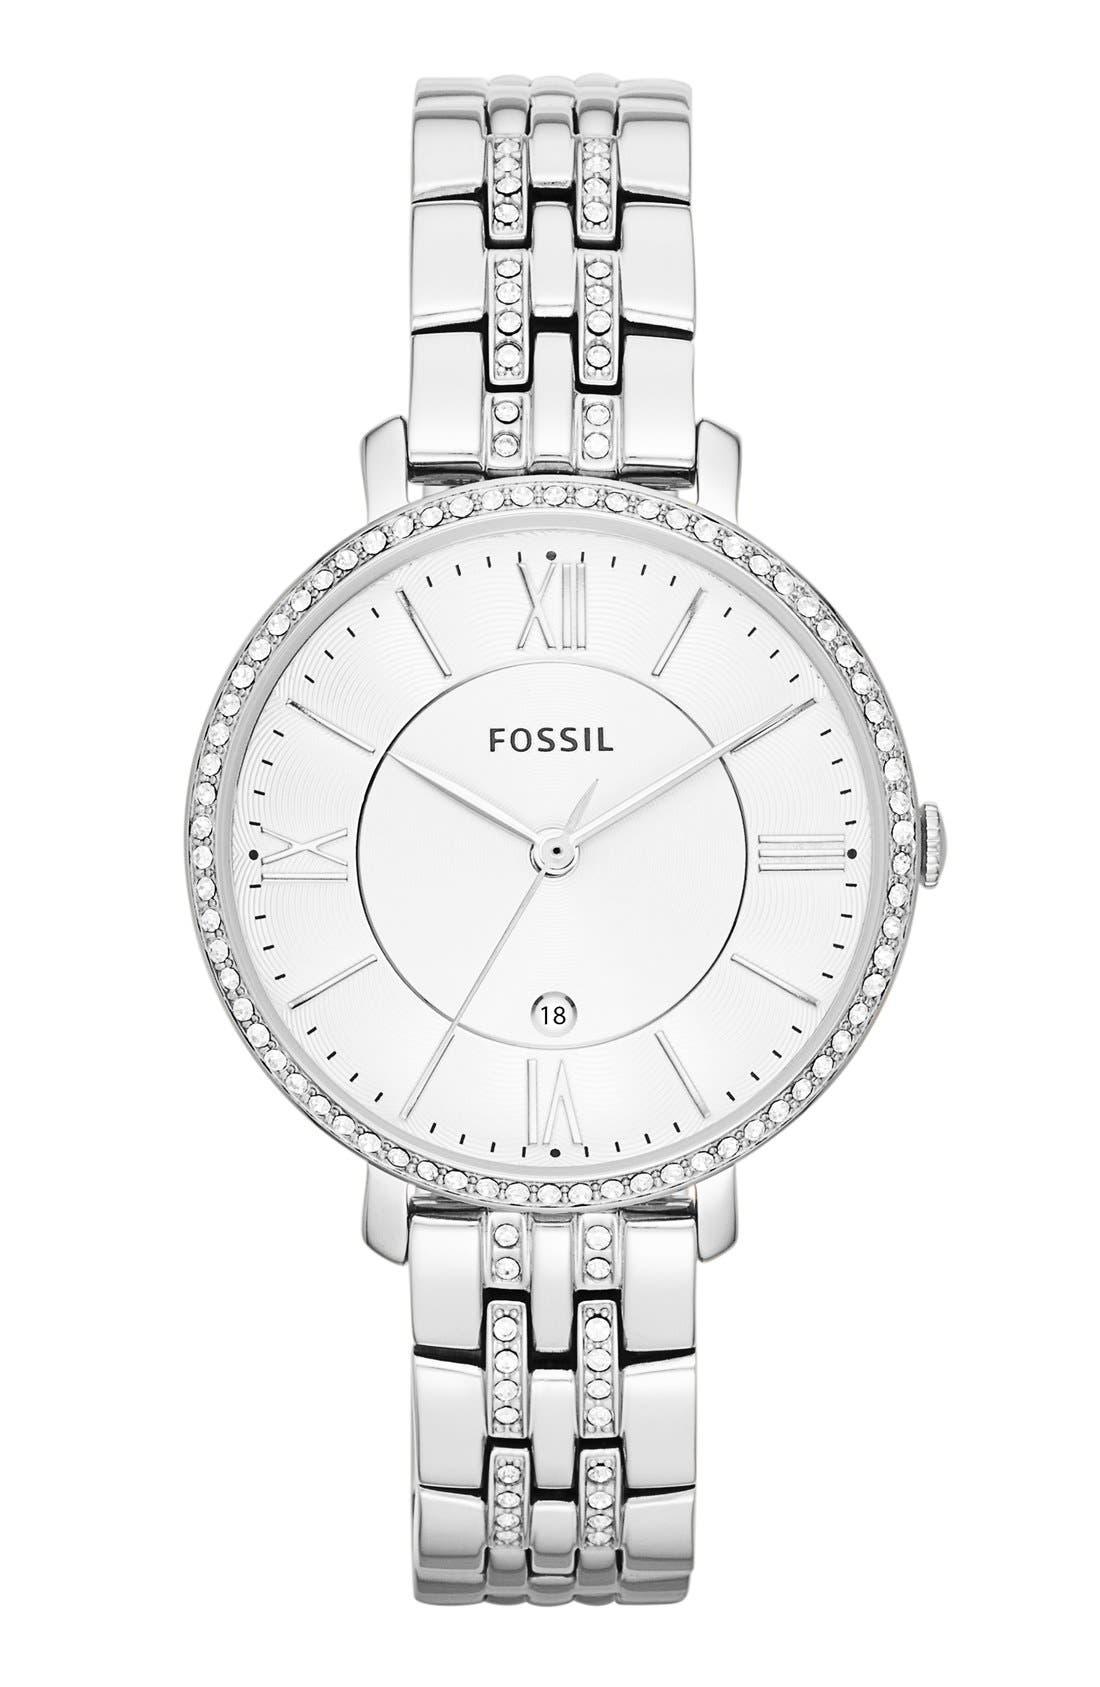 FOSSIL, 'Jacqueline' Crystal Bezel Bracelet Watch, 36mm, Main thumbnail 1, color, SILVER